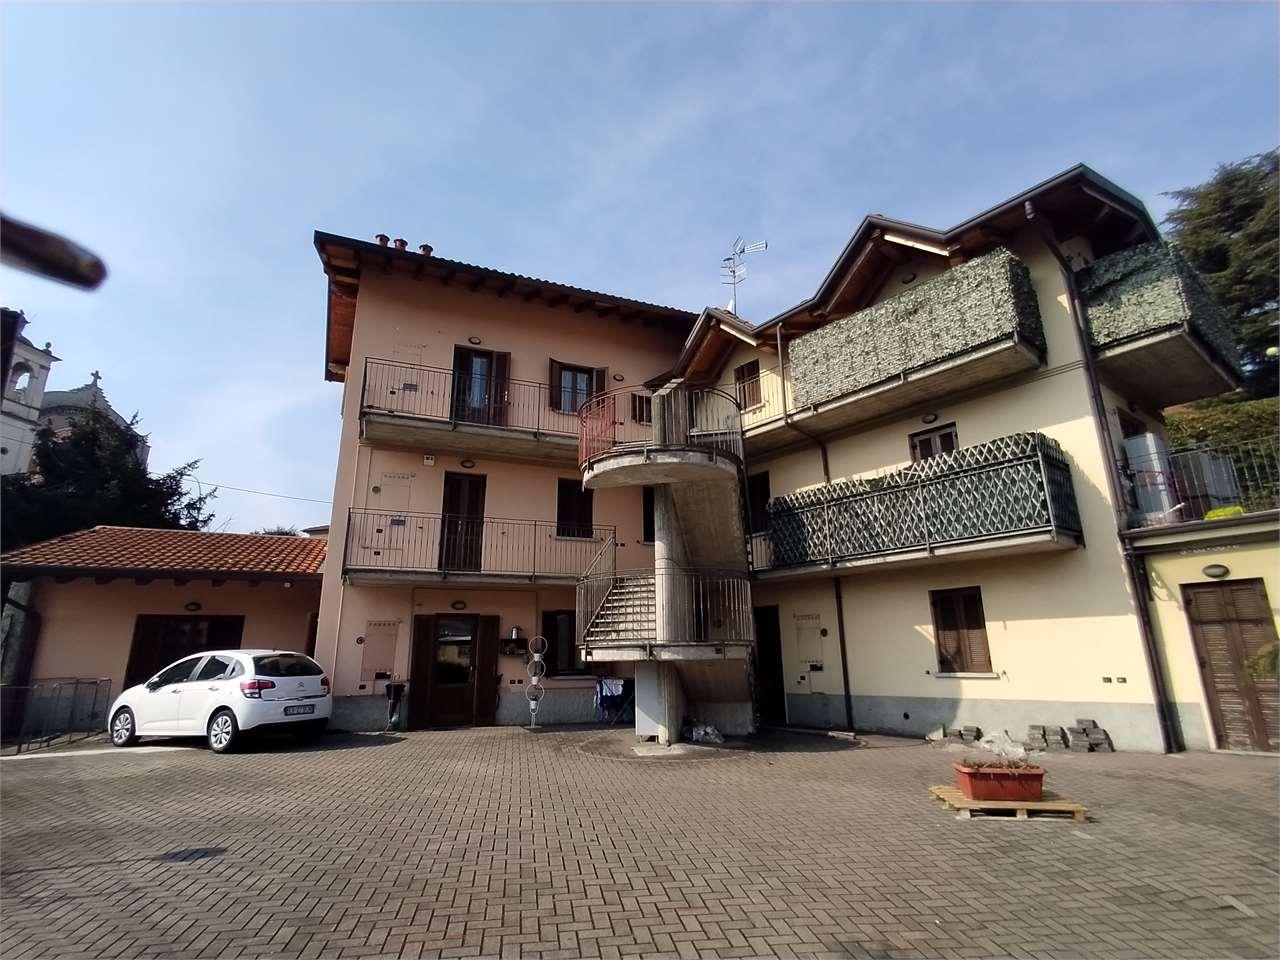 Vendita Trilocale Appartamento Cisano Bergamasco Via Antonio Rosmini 8 297418